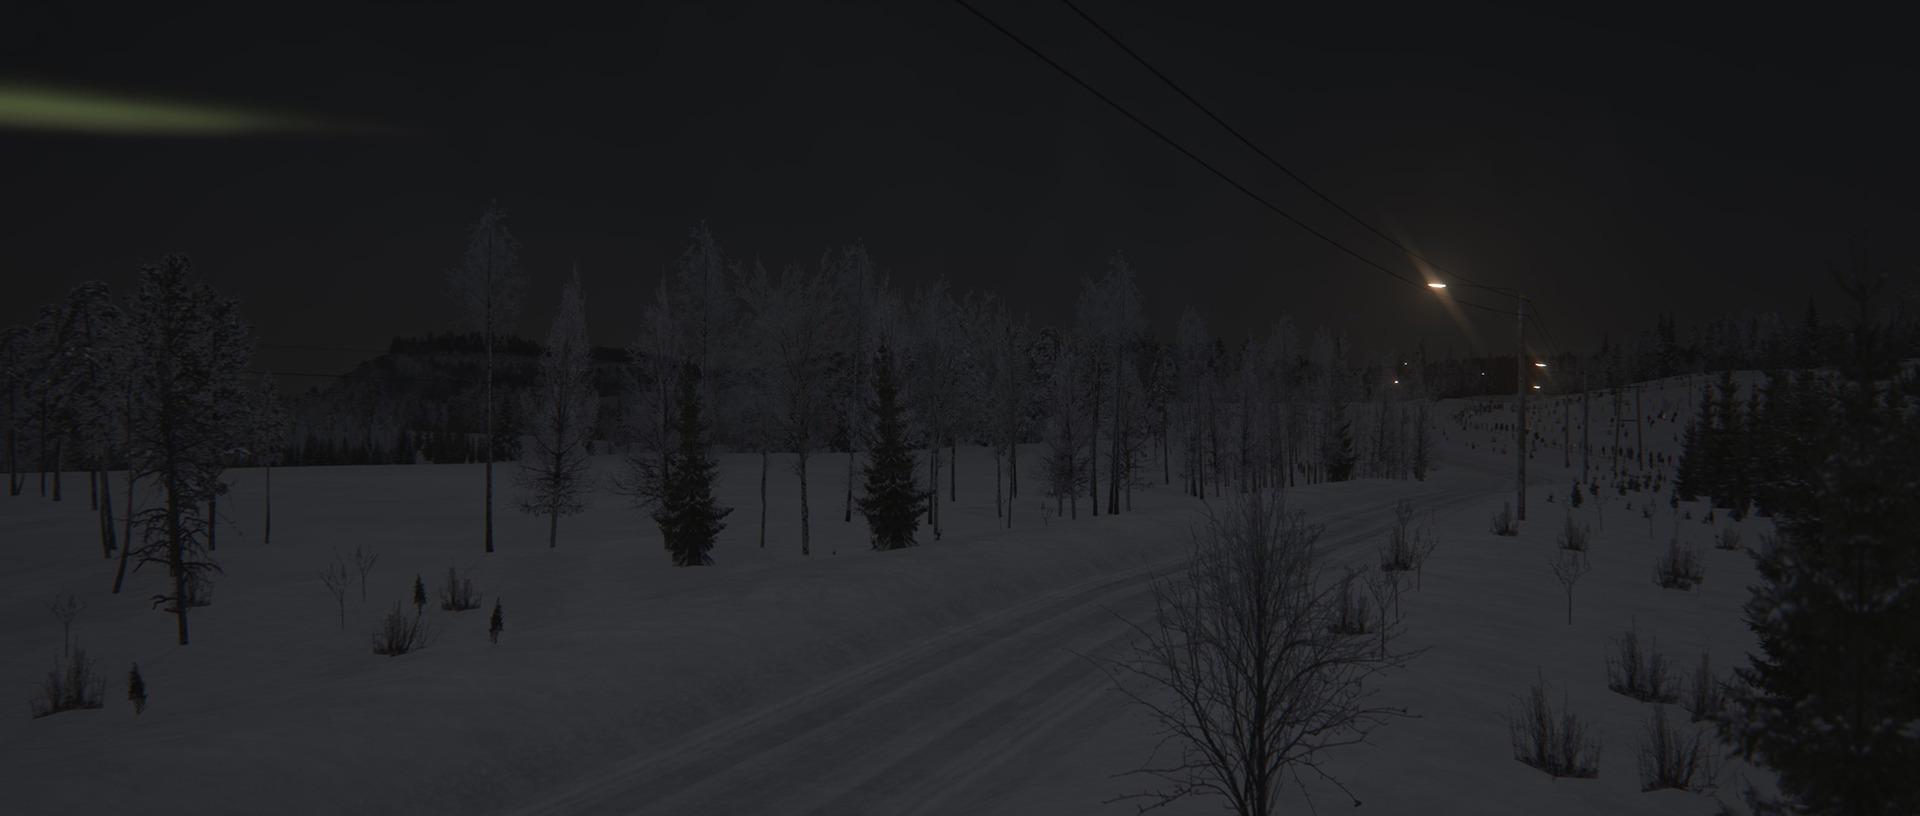 Kuadonvaara_sprint_night.jpg